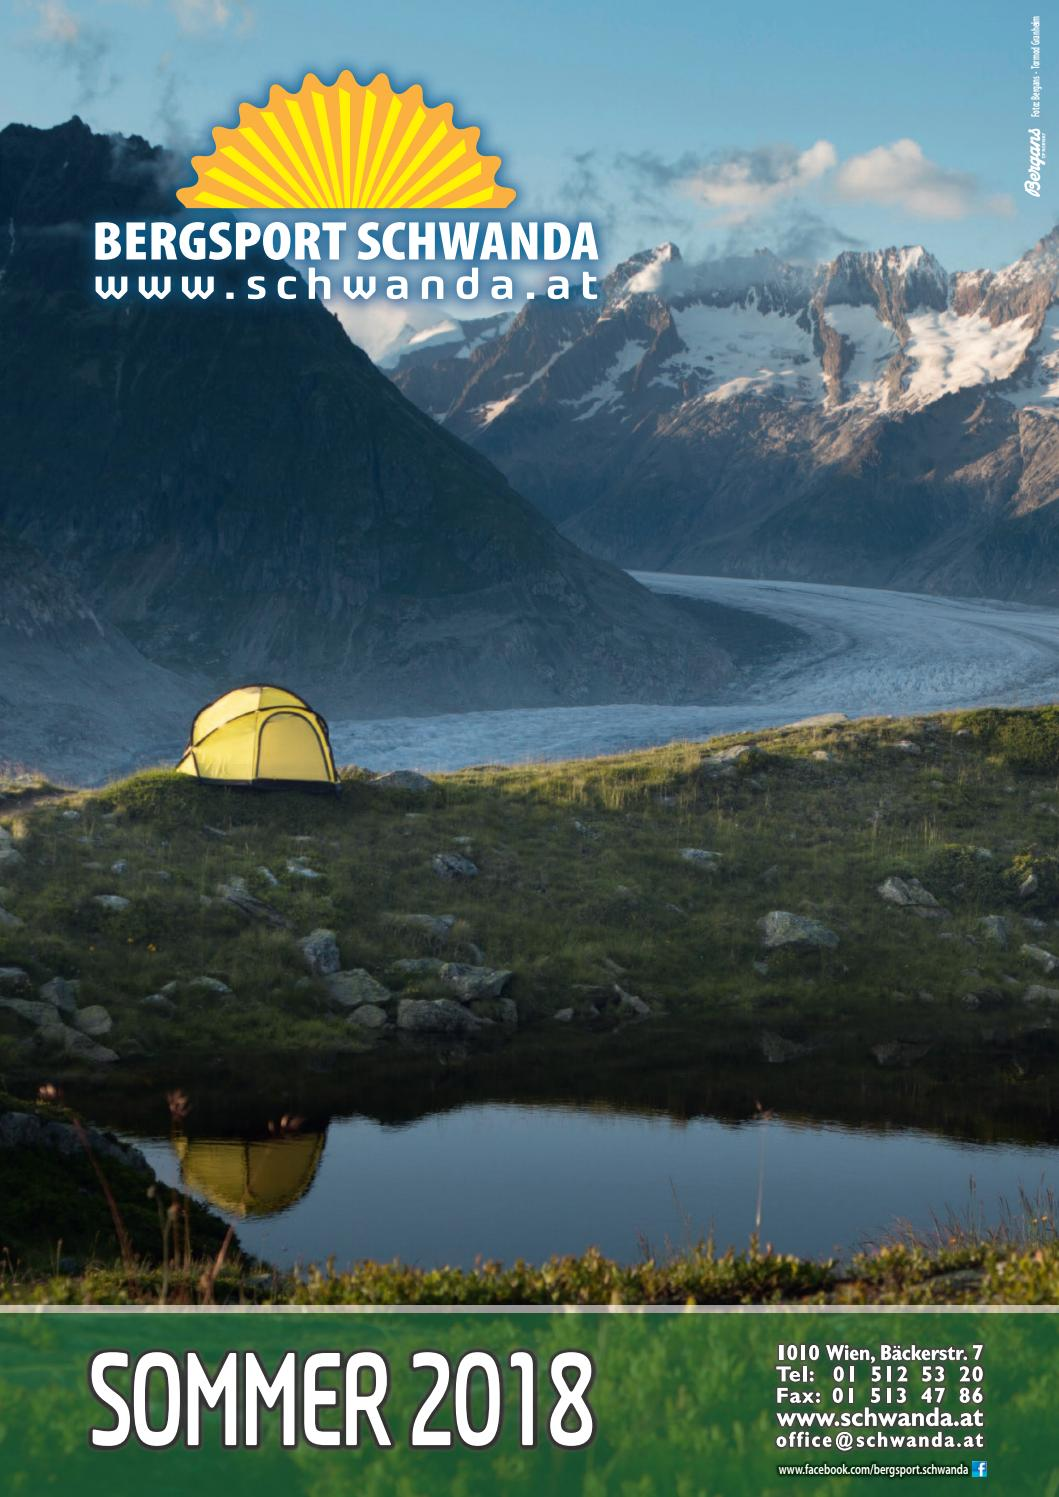 Bergsport Schwanda Sommer 2018 by Bergsport.Schwanda - issuu